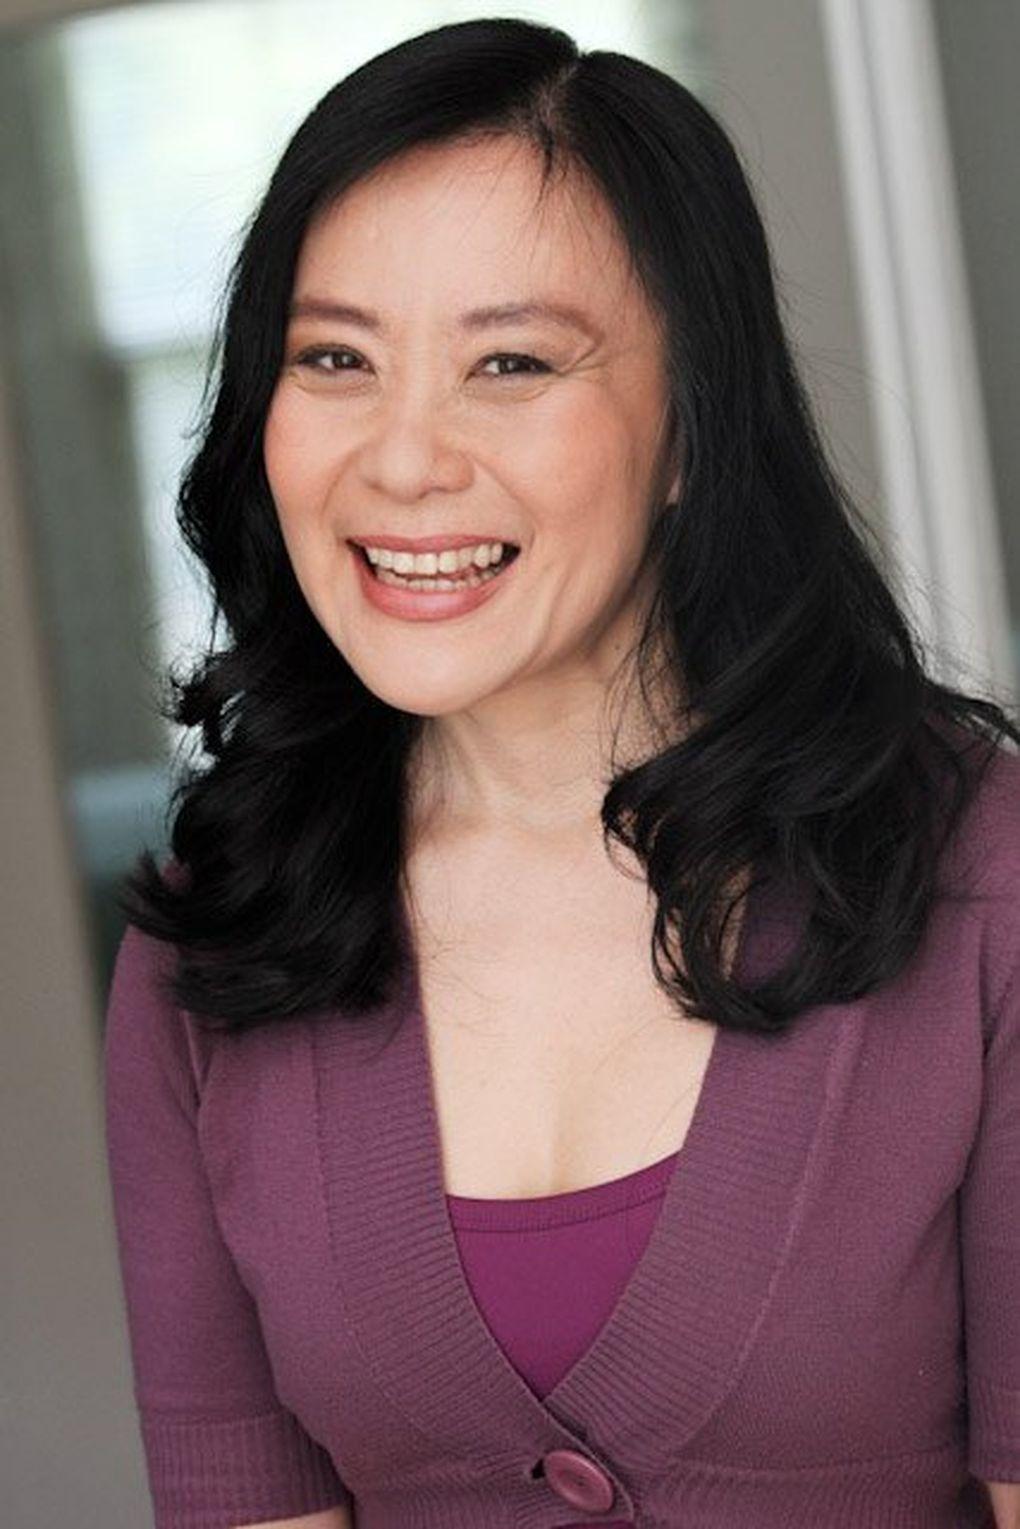 Kathy Hsieh, co-director of SIS Productions. (John Ulman)